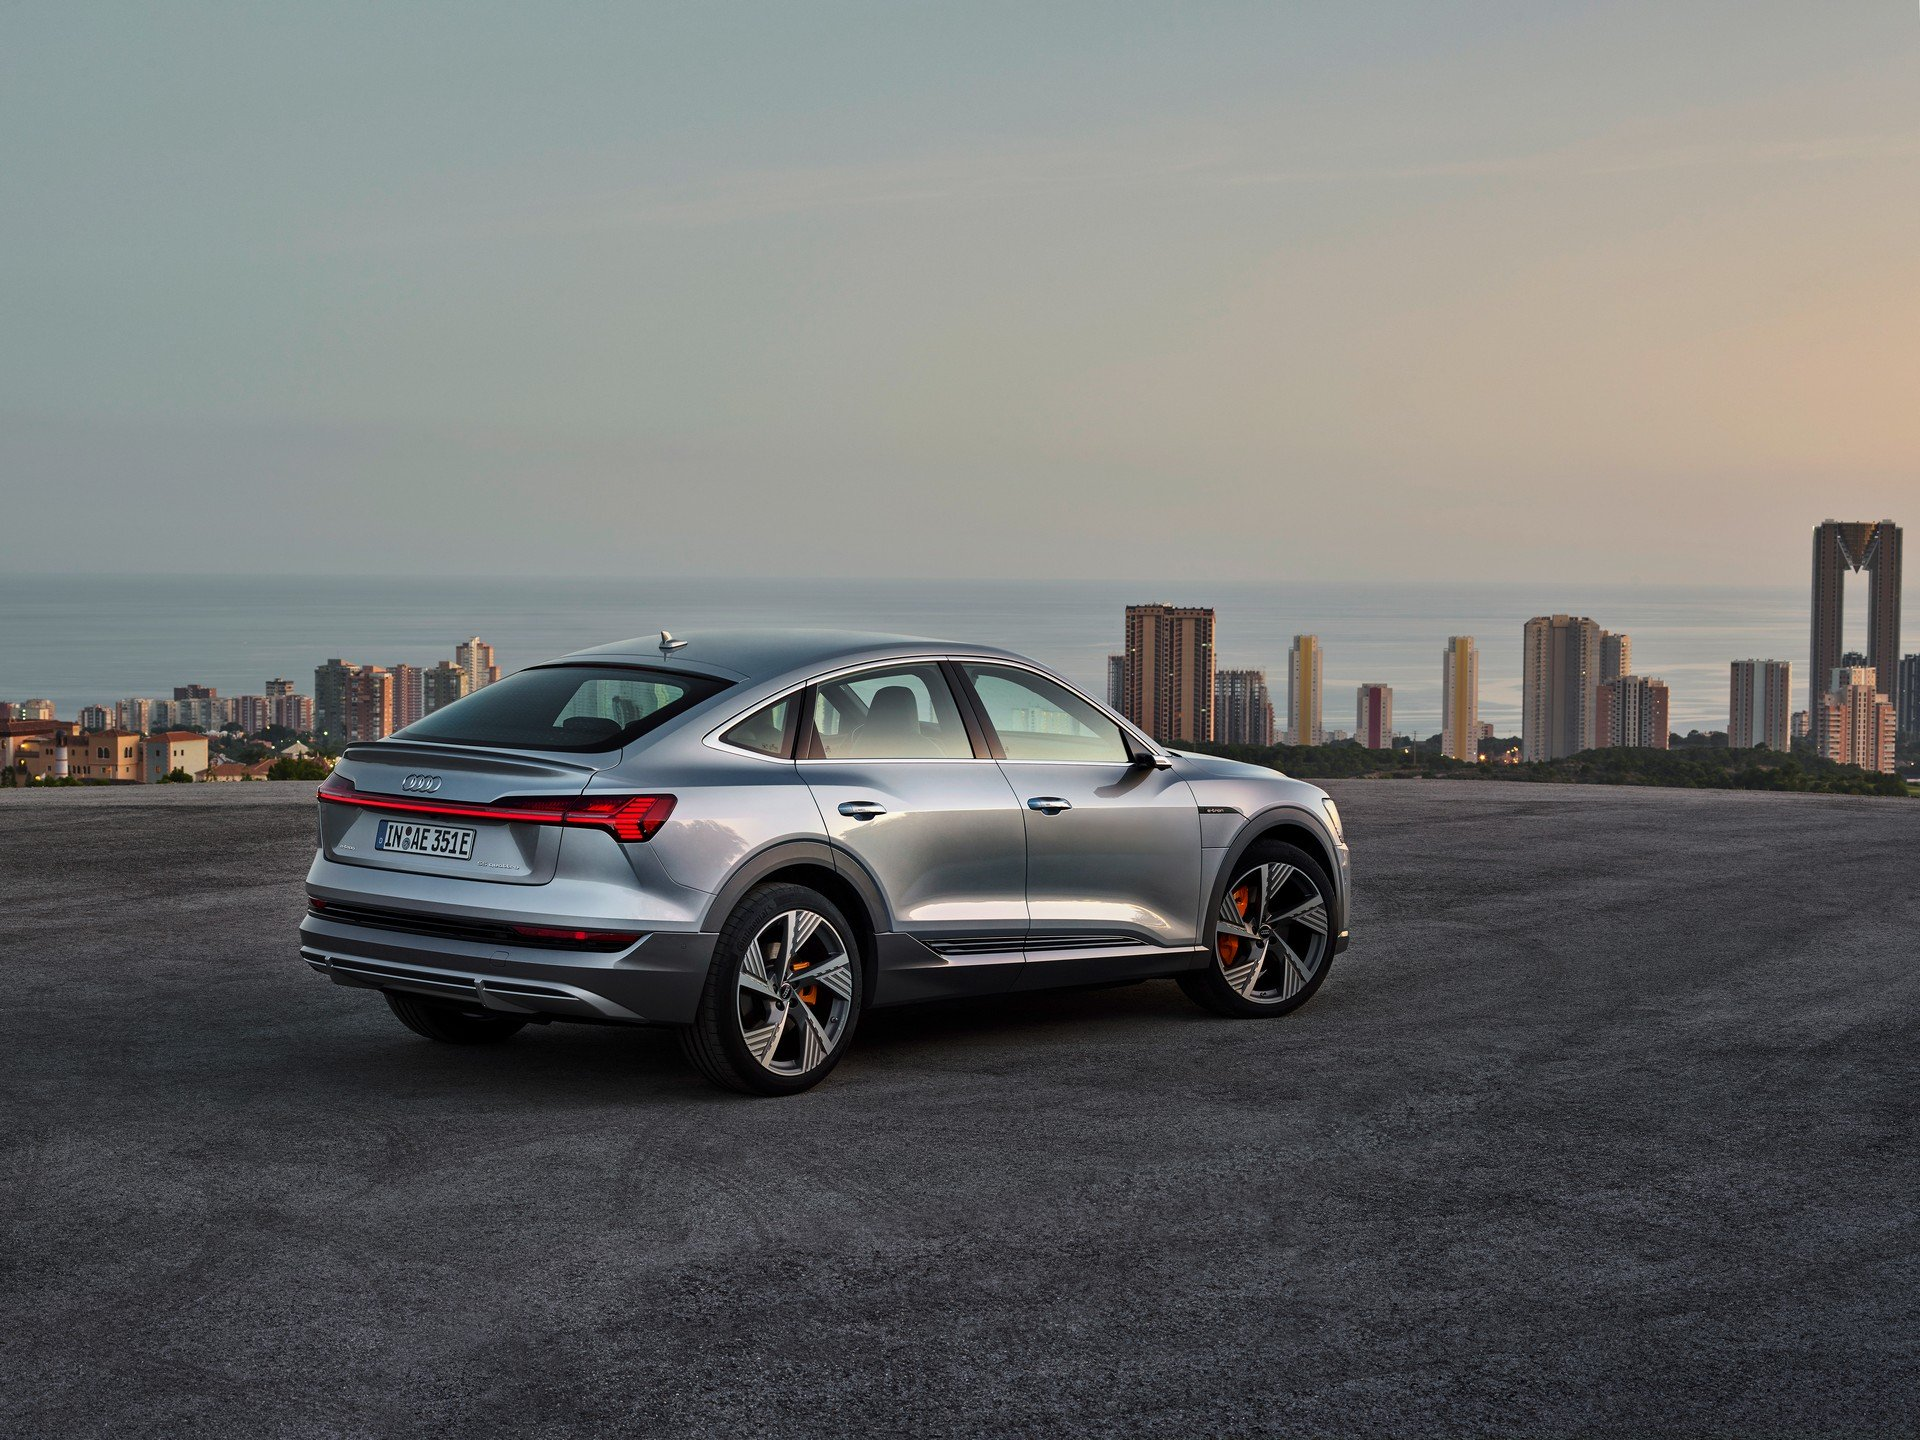 2020-Audi-E-Tron-Sportback-12 (1)